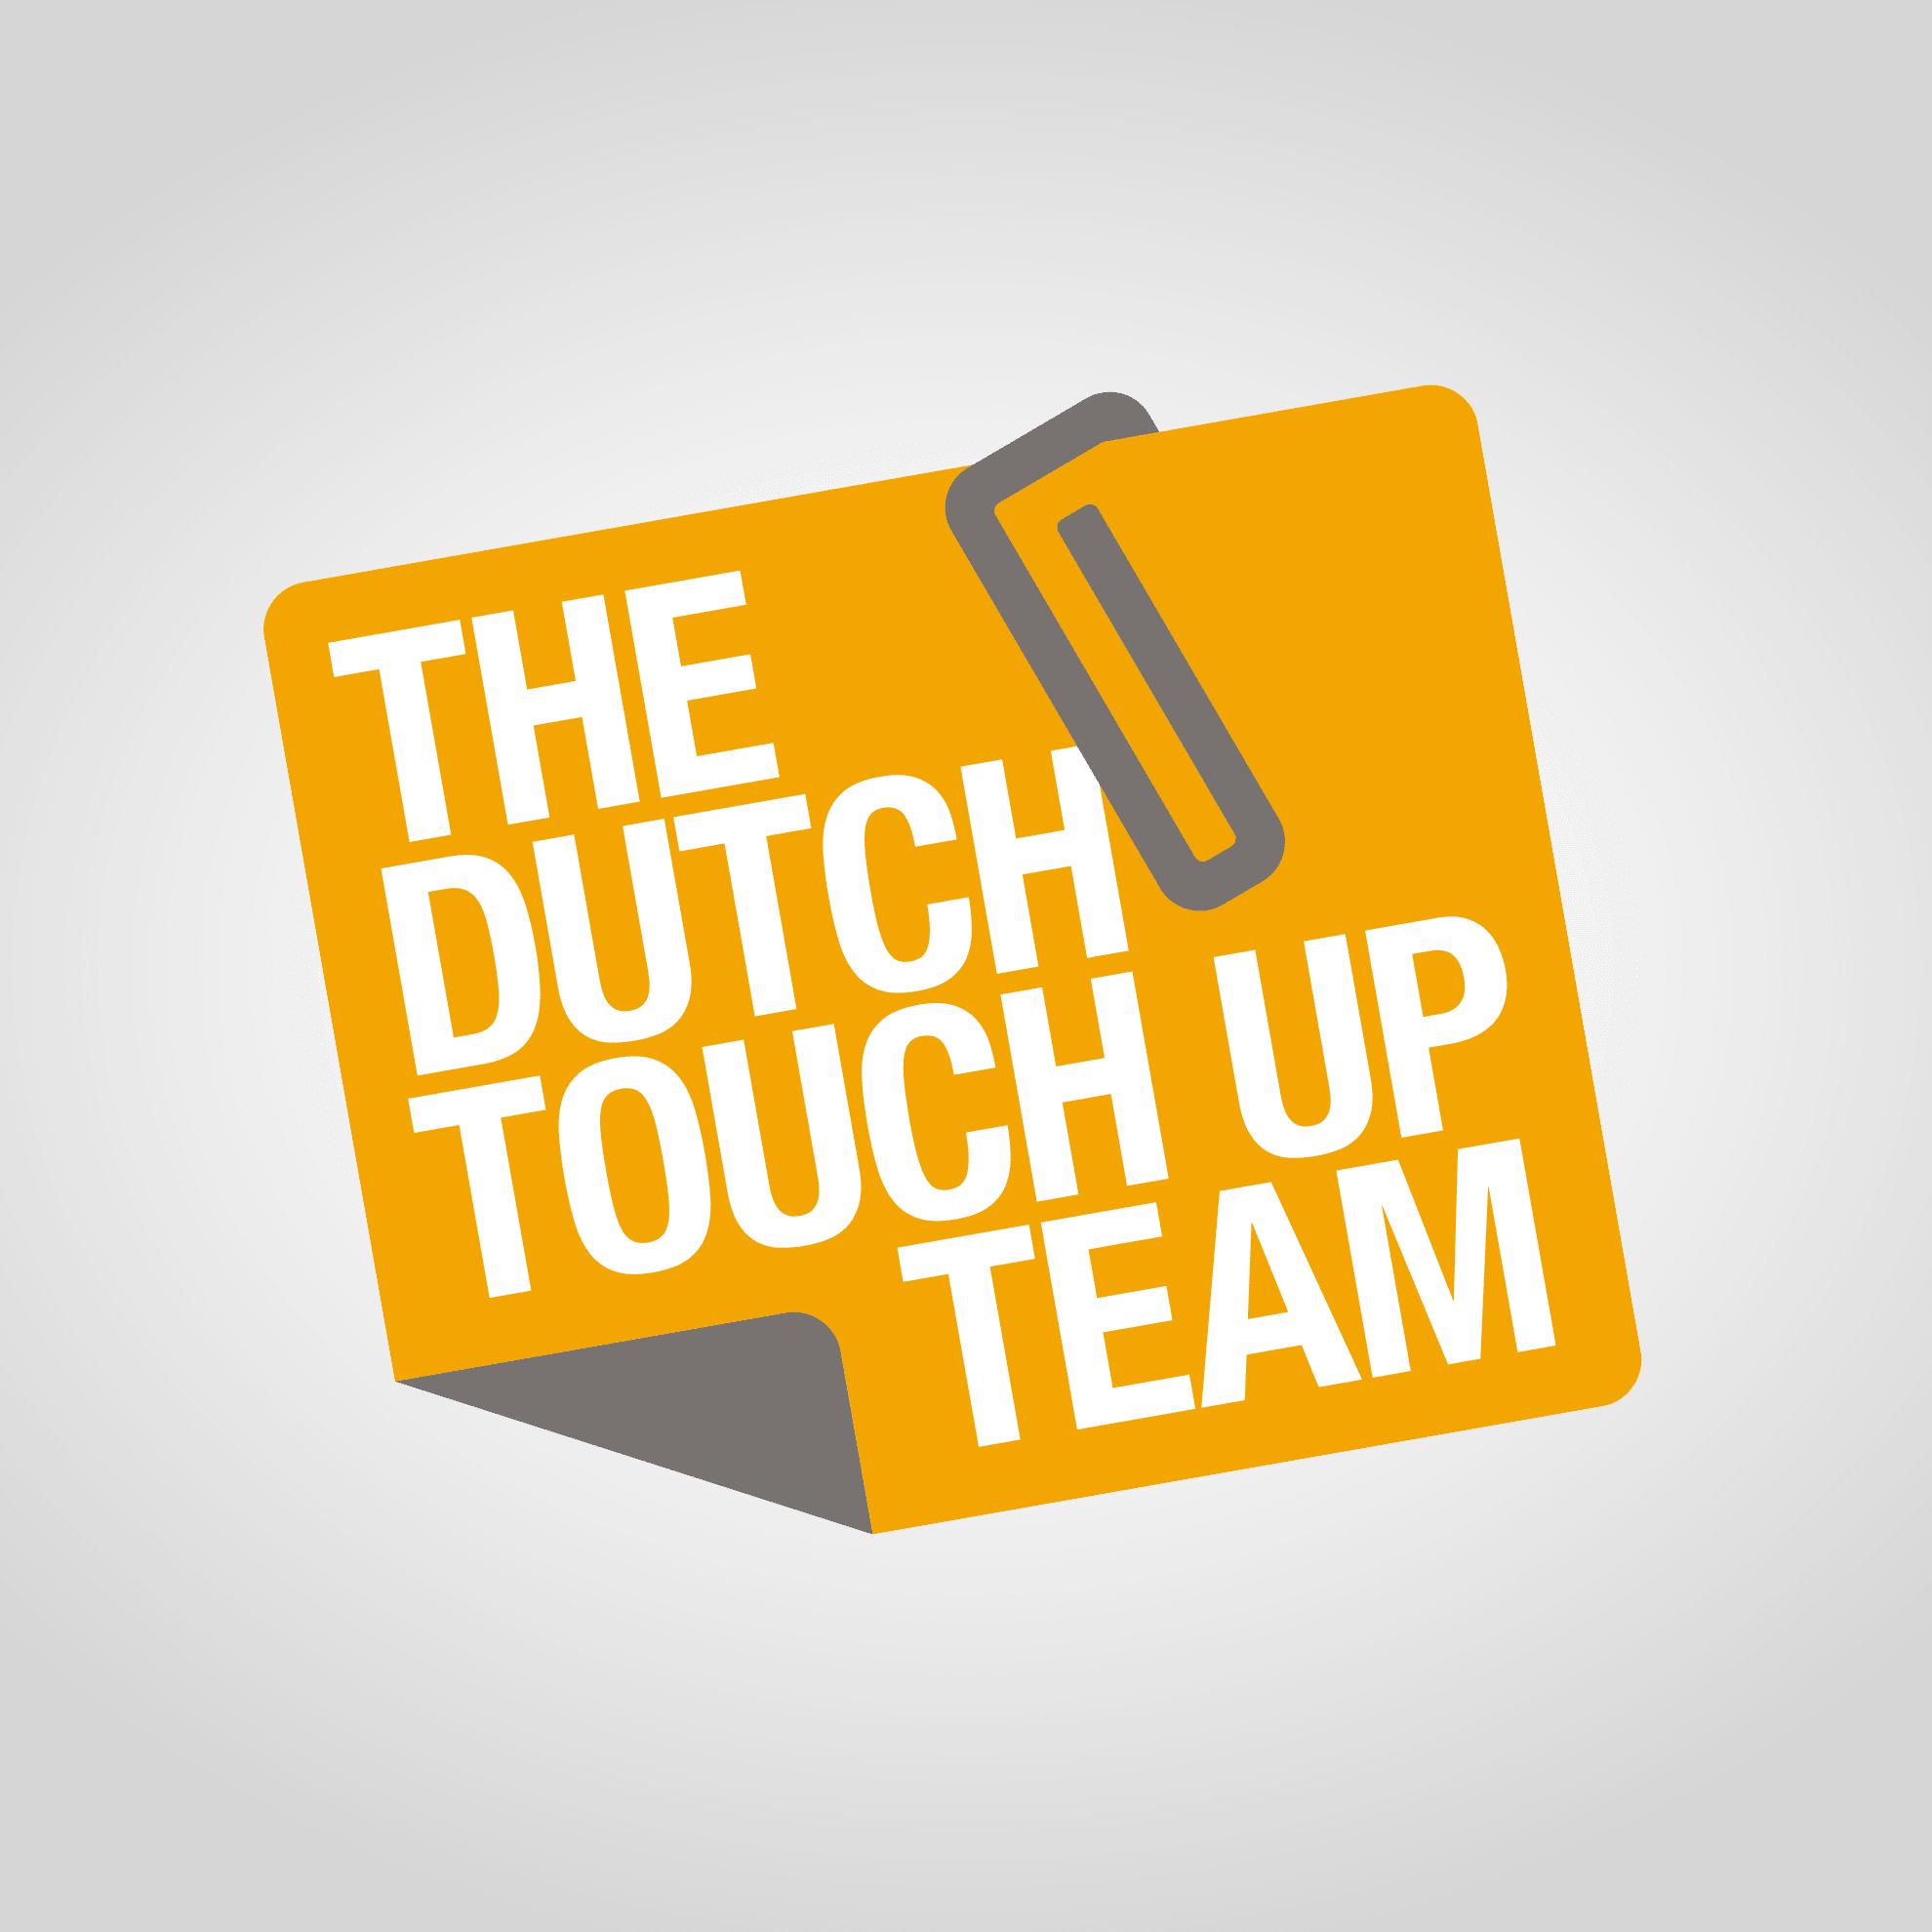 dutch touch up team | The Dutch touch up team logo